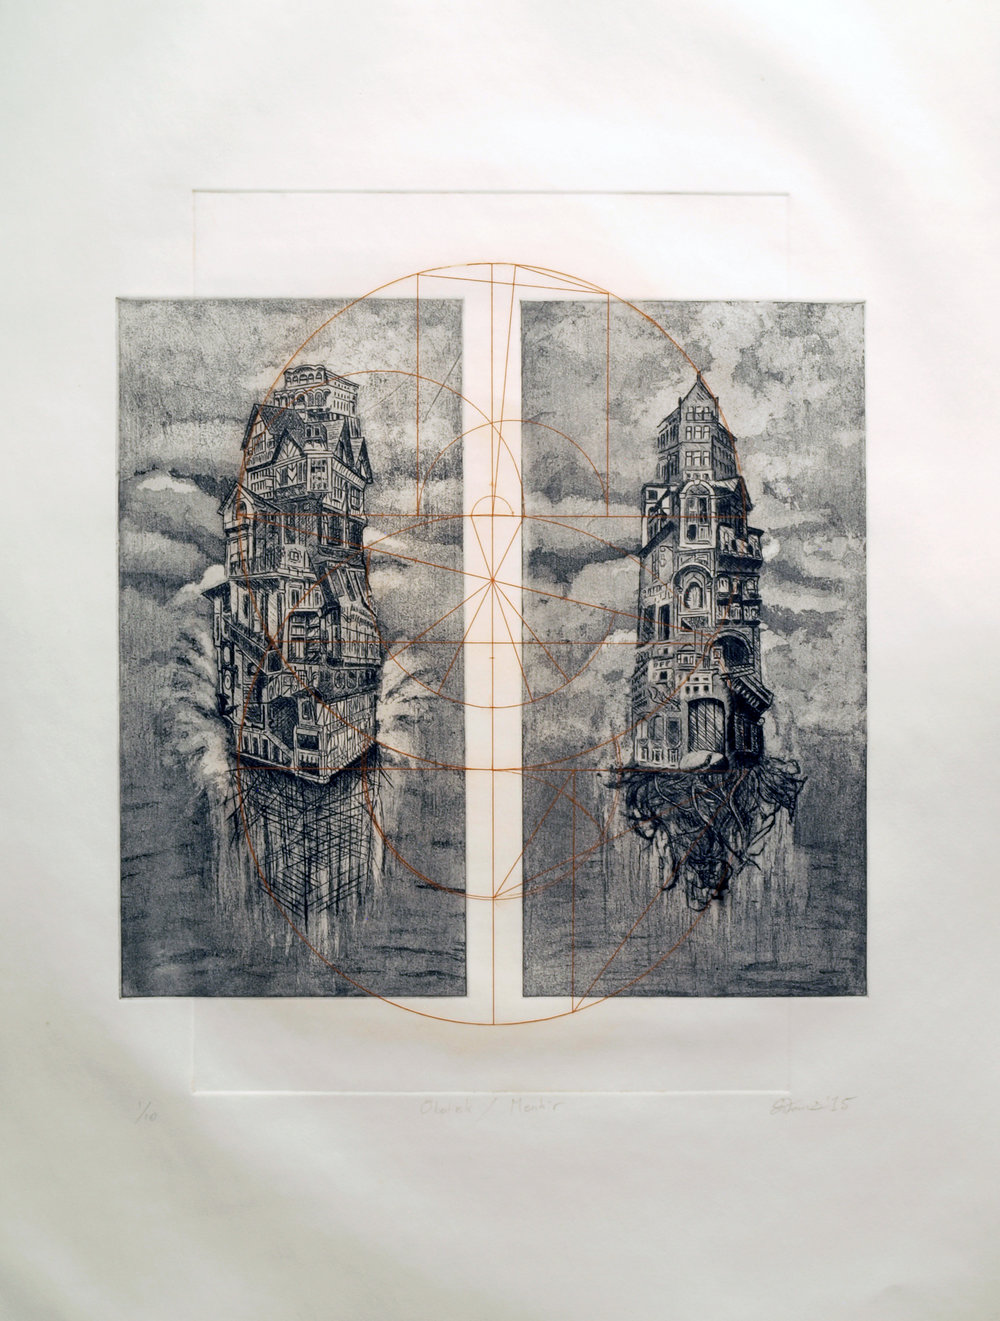 Obelisk/Menhir, 2015